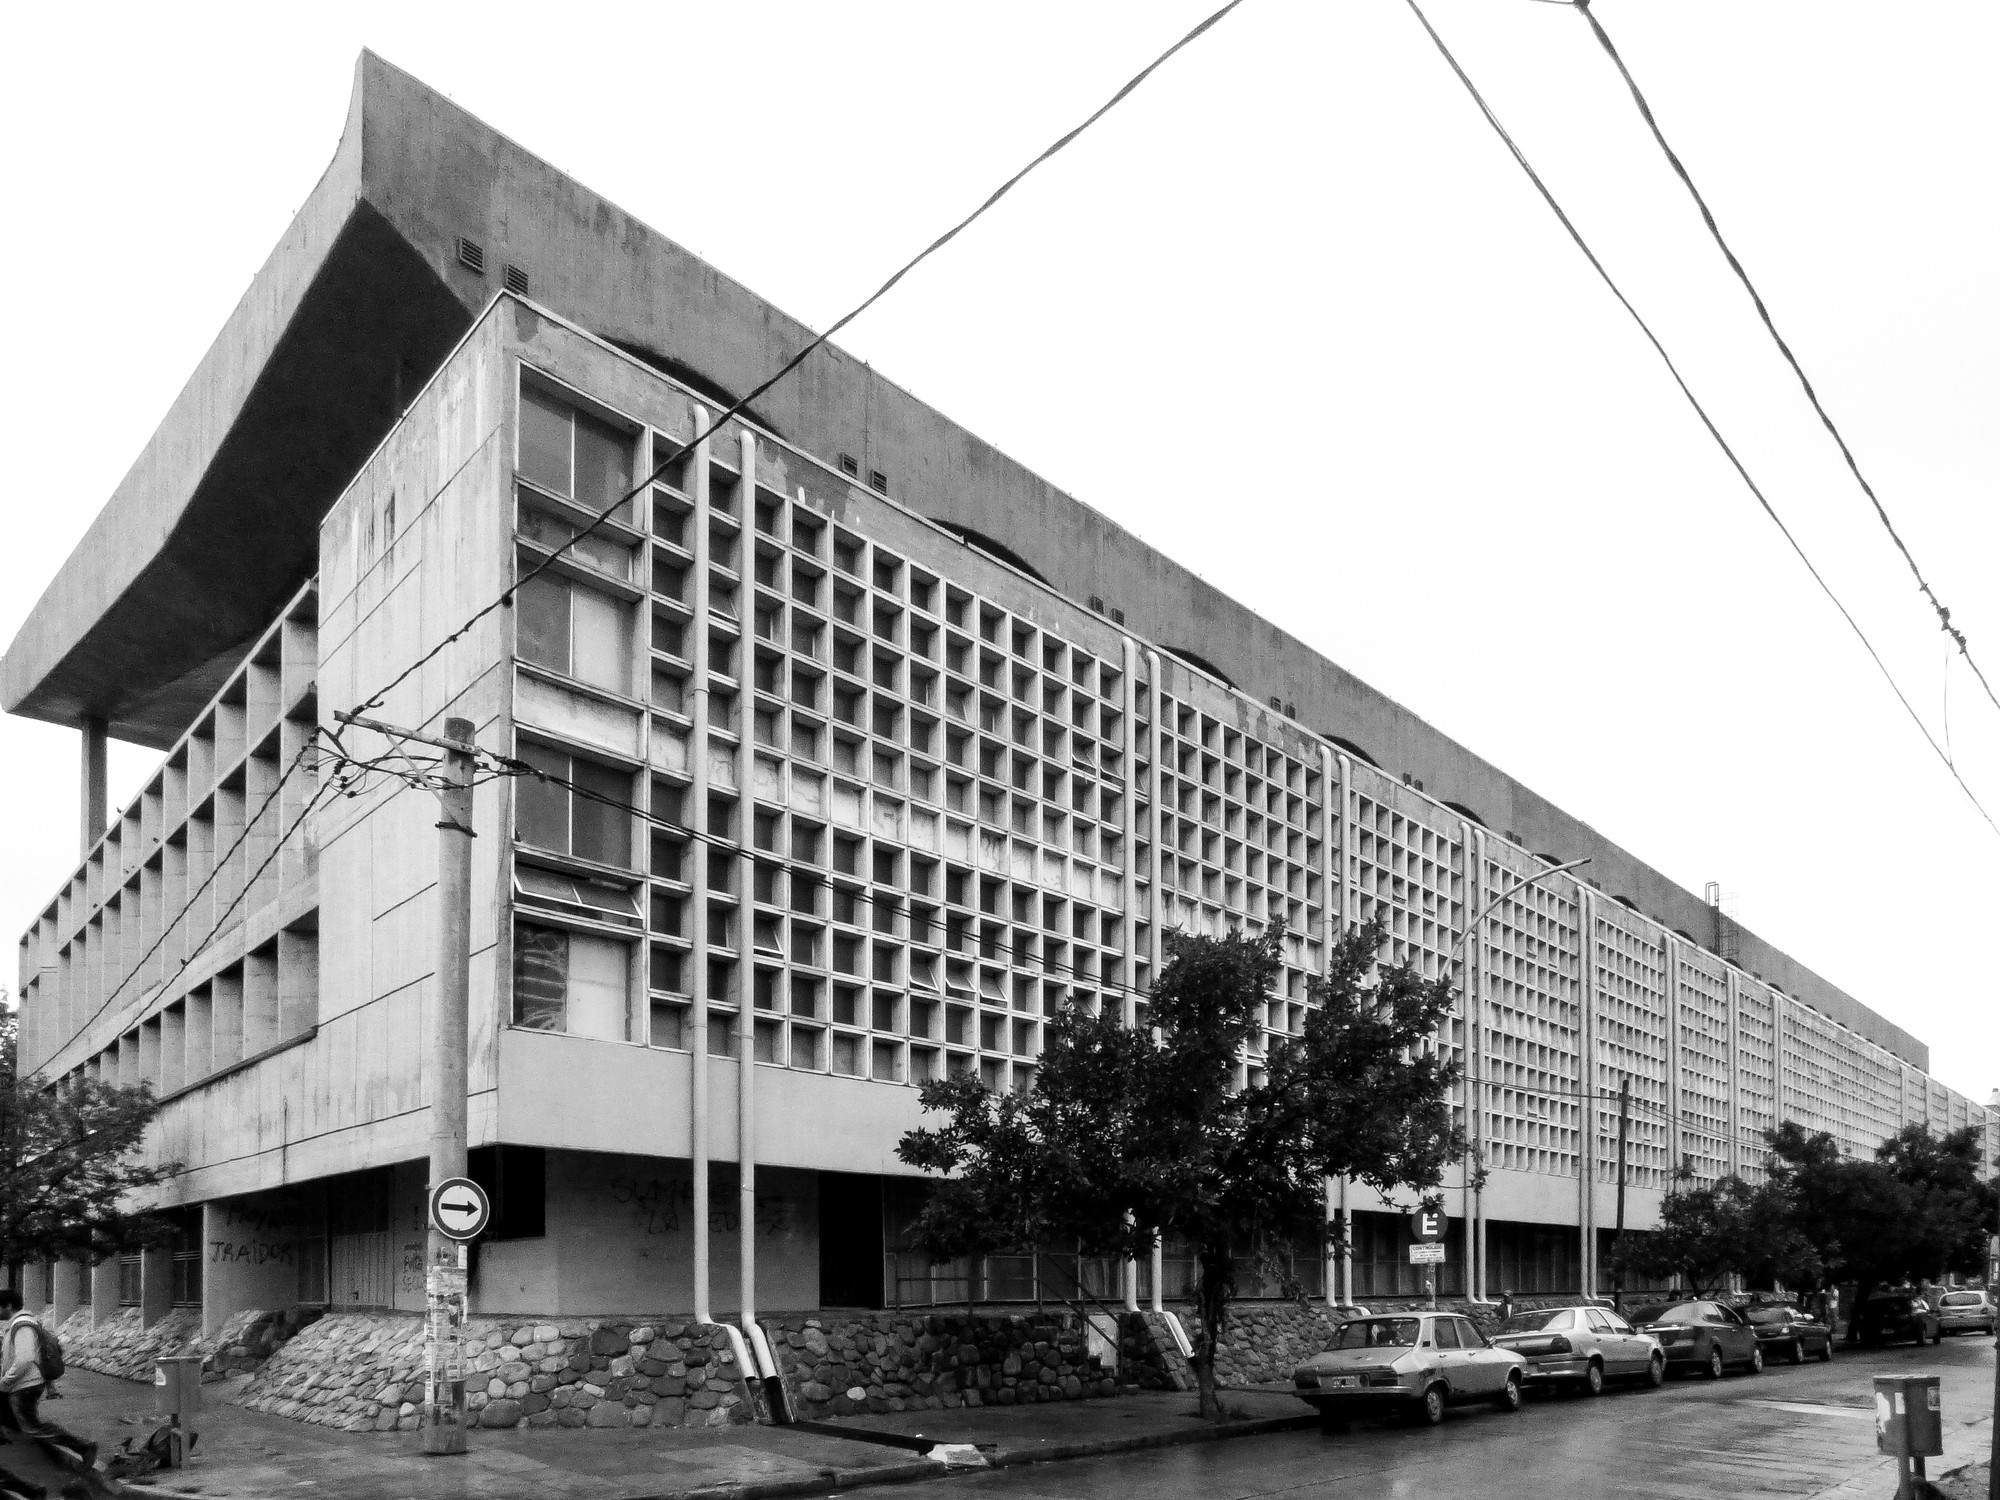 Clásicos de Arquitectura: Colegio Manuel Belgrano / Bidinost+Chute+Gasó+Lapacó+Meyer, © Arq. Gonzalo Viramonte